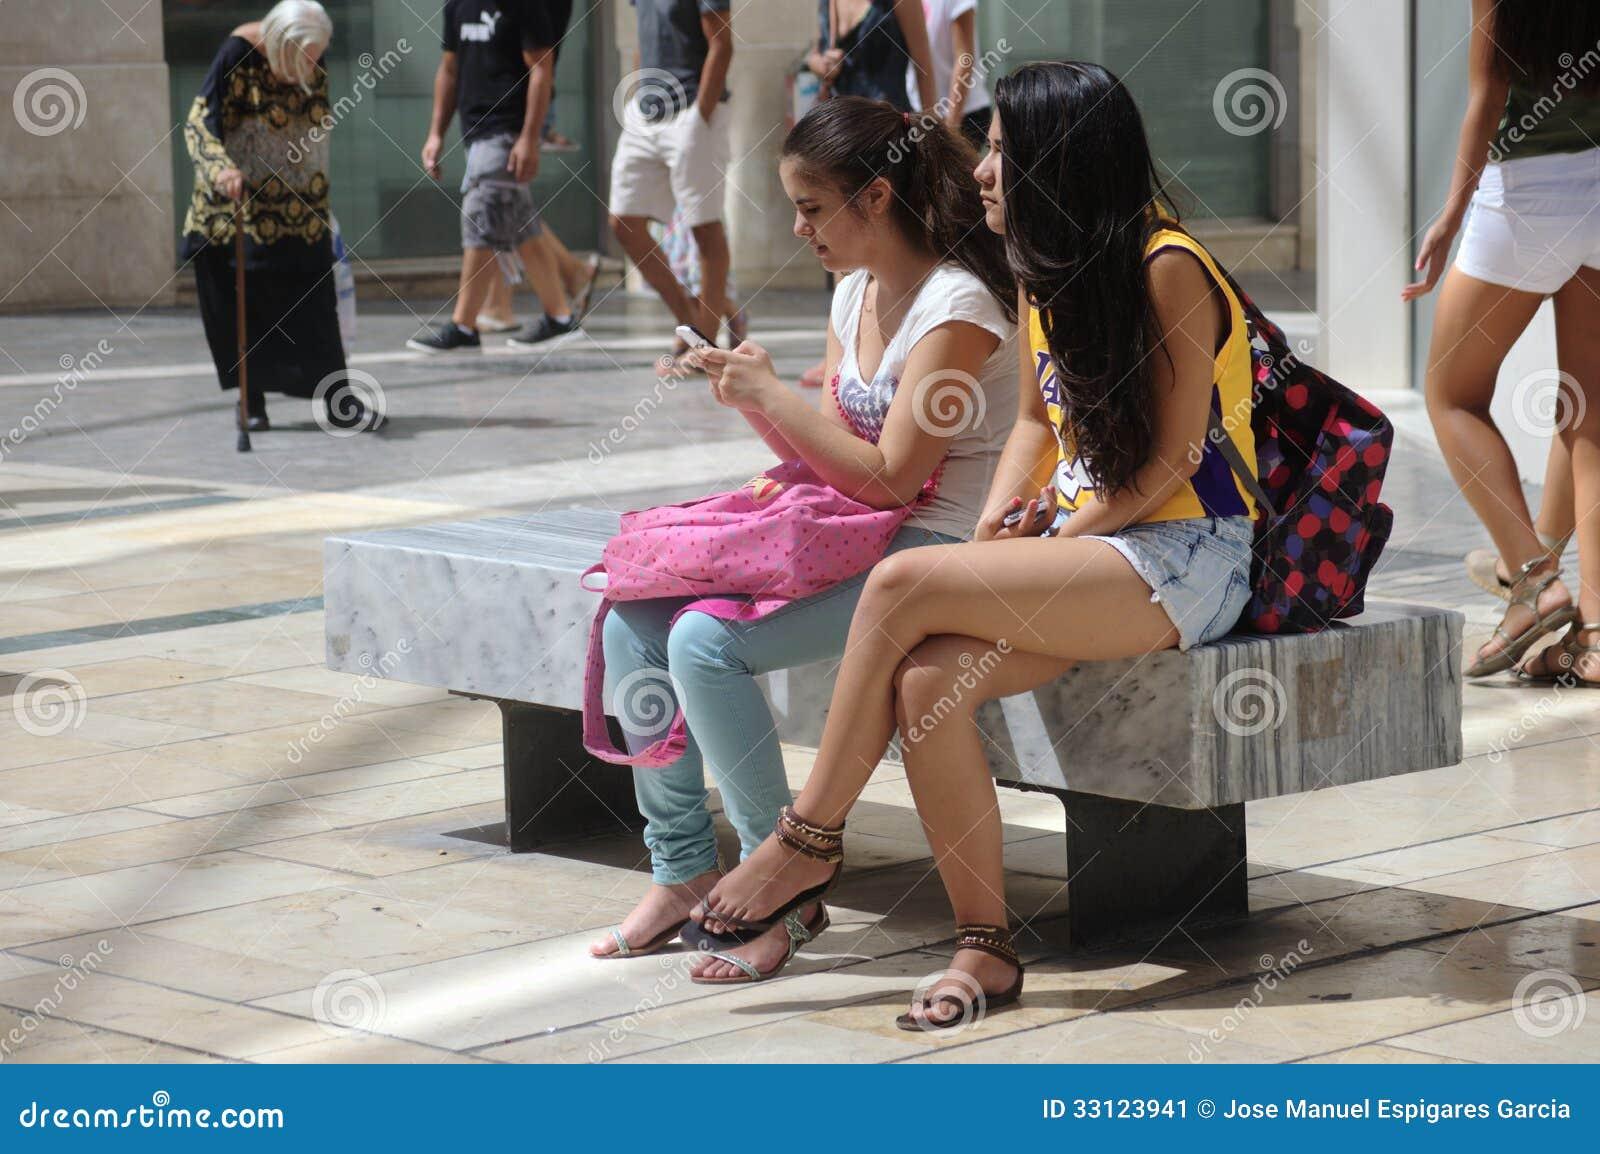 malaga girls